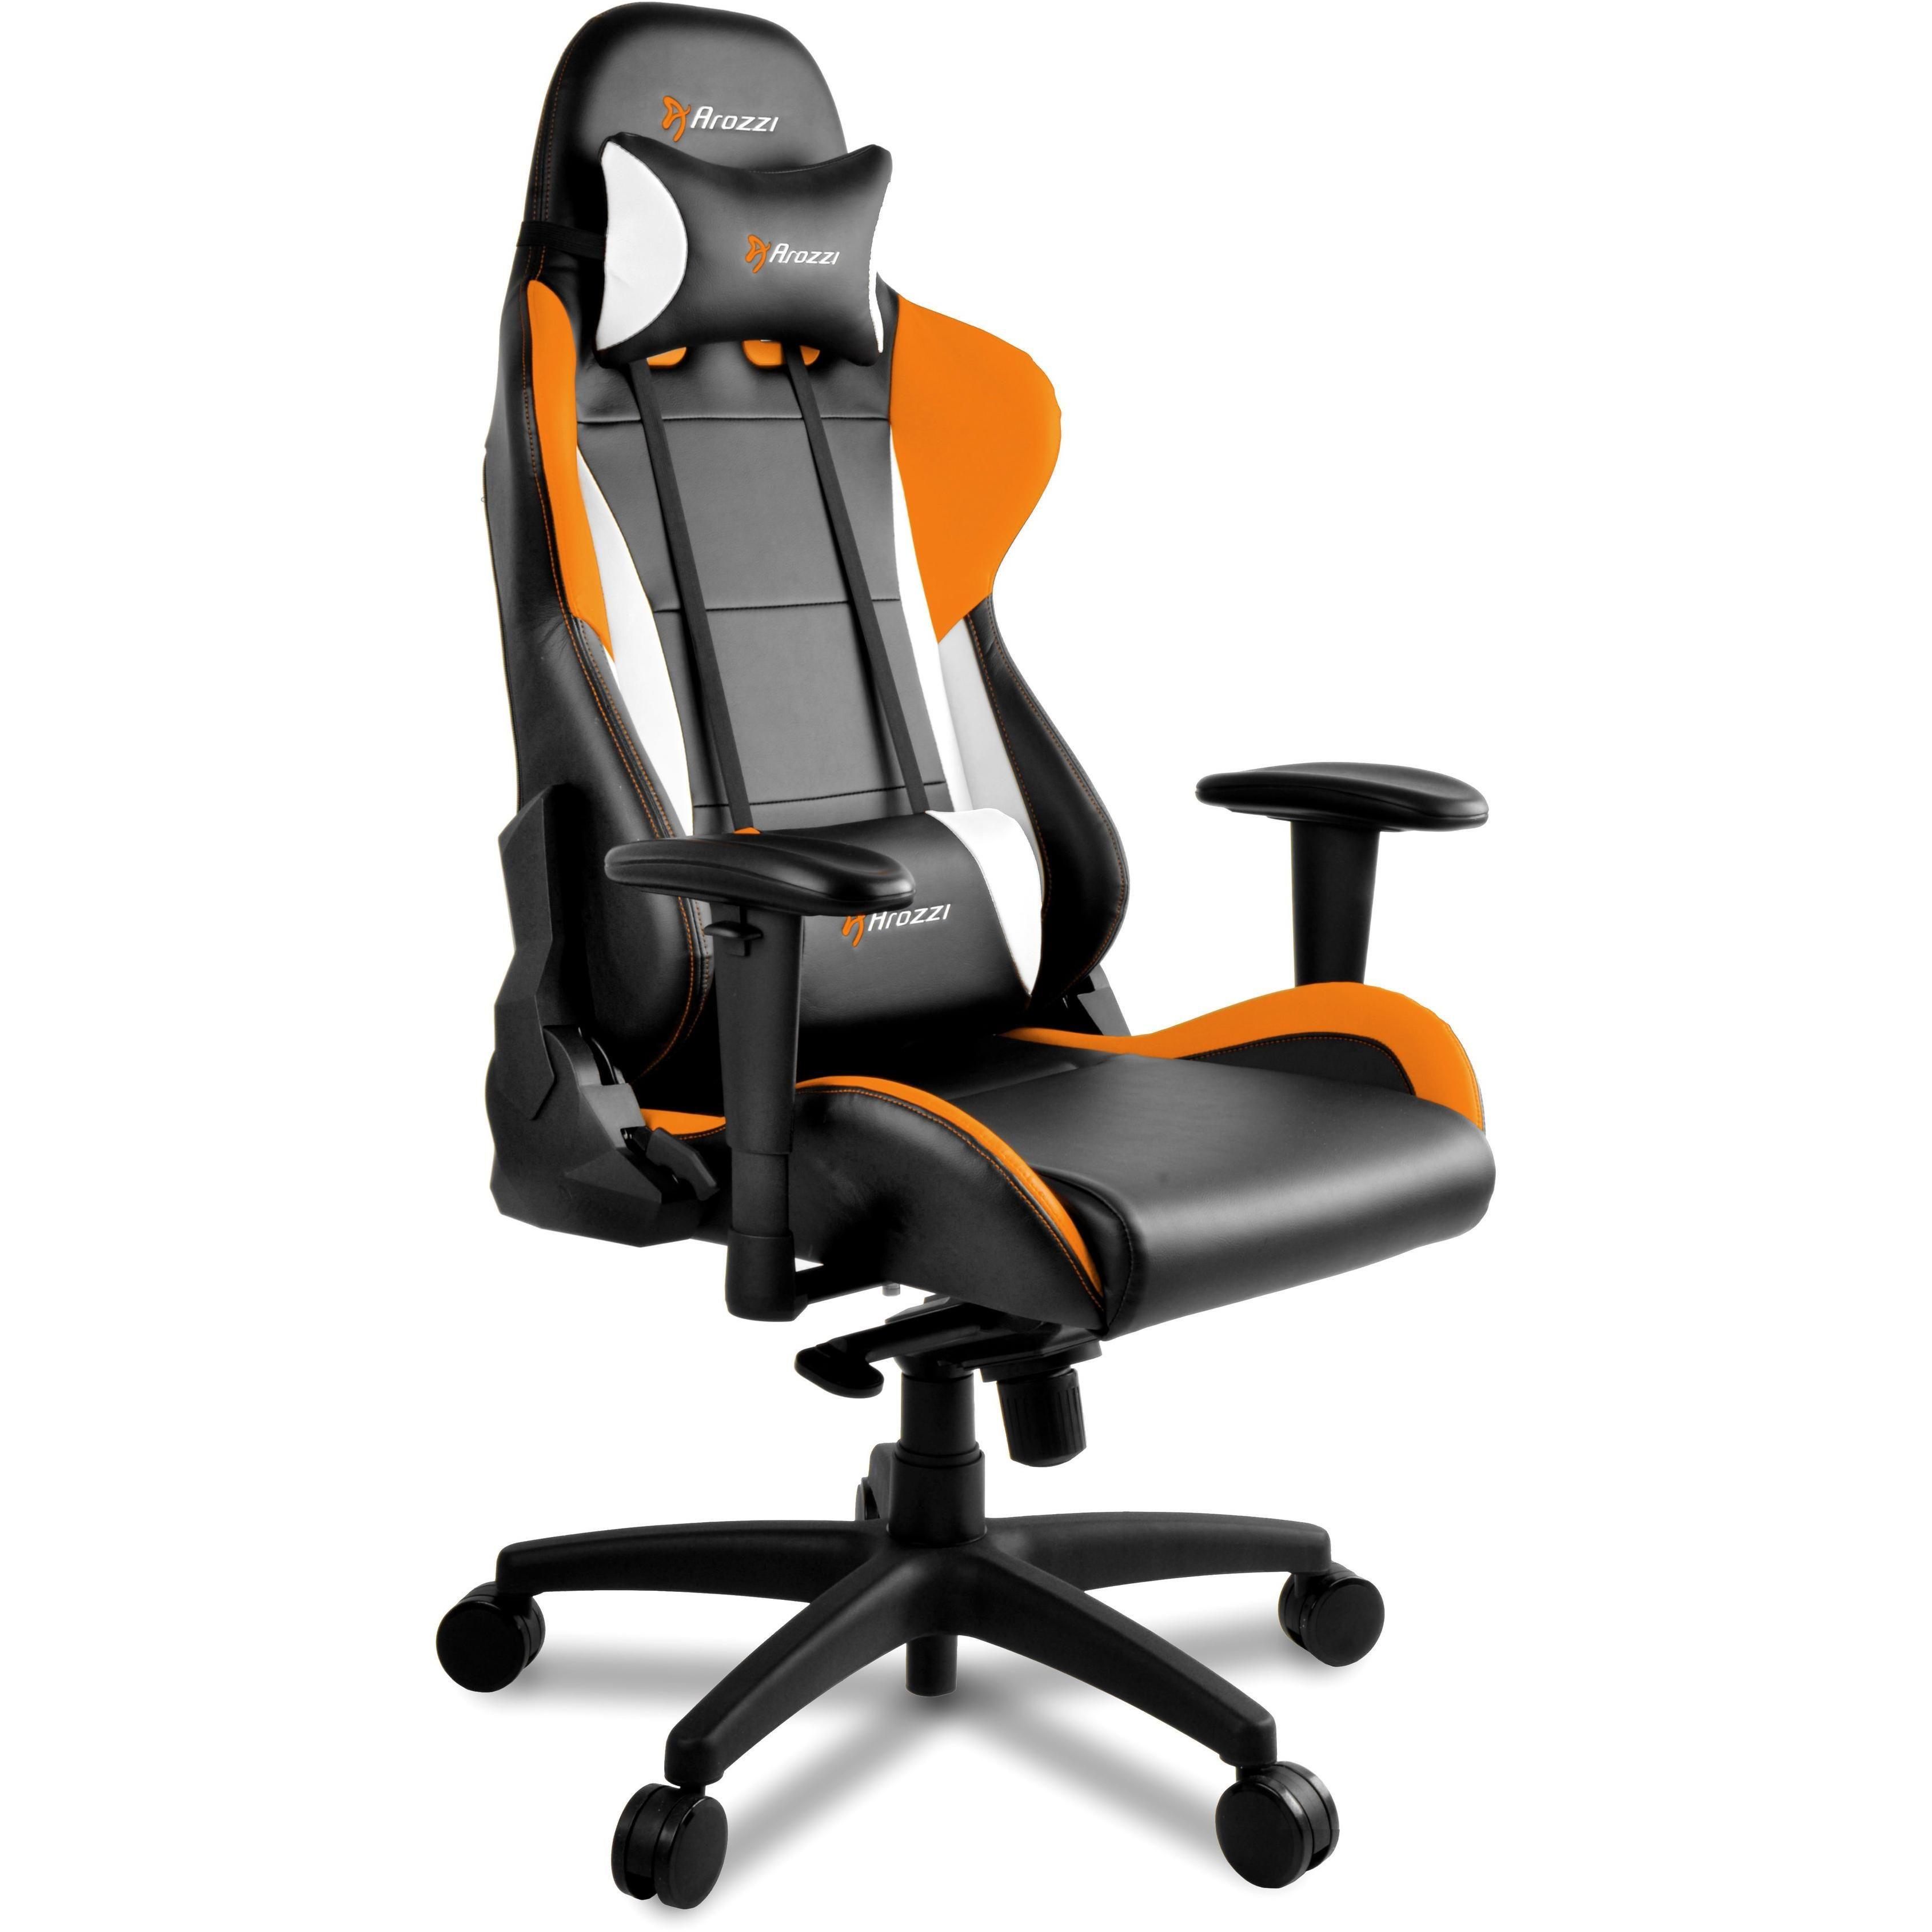 Sensational Arozzi Verona Pro V2 Orange Black Gaming Chair Products Machost Co Dining Chair Design Ideas Machostcouk